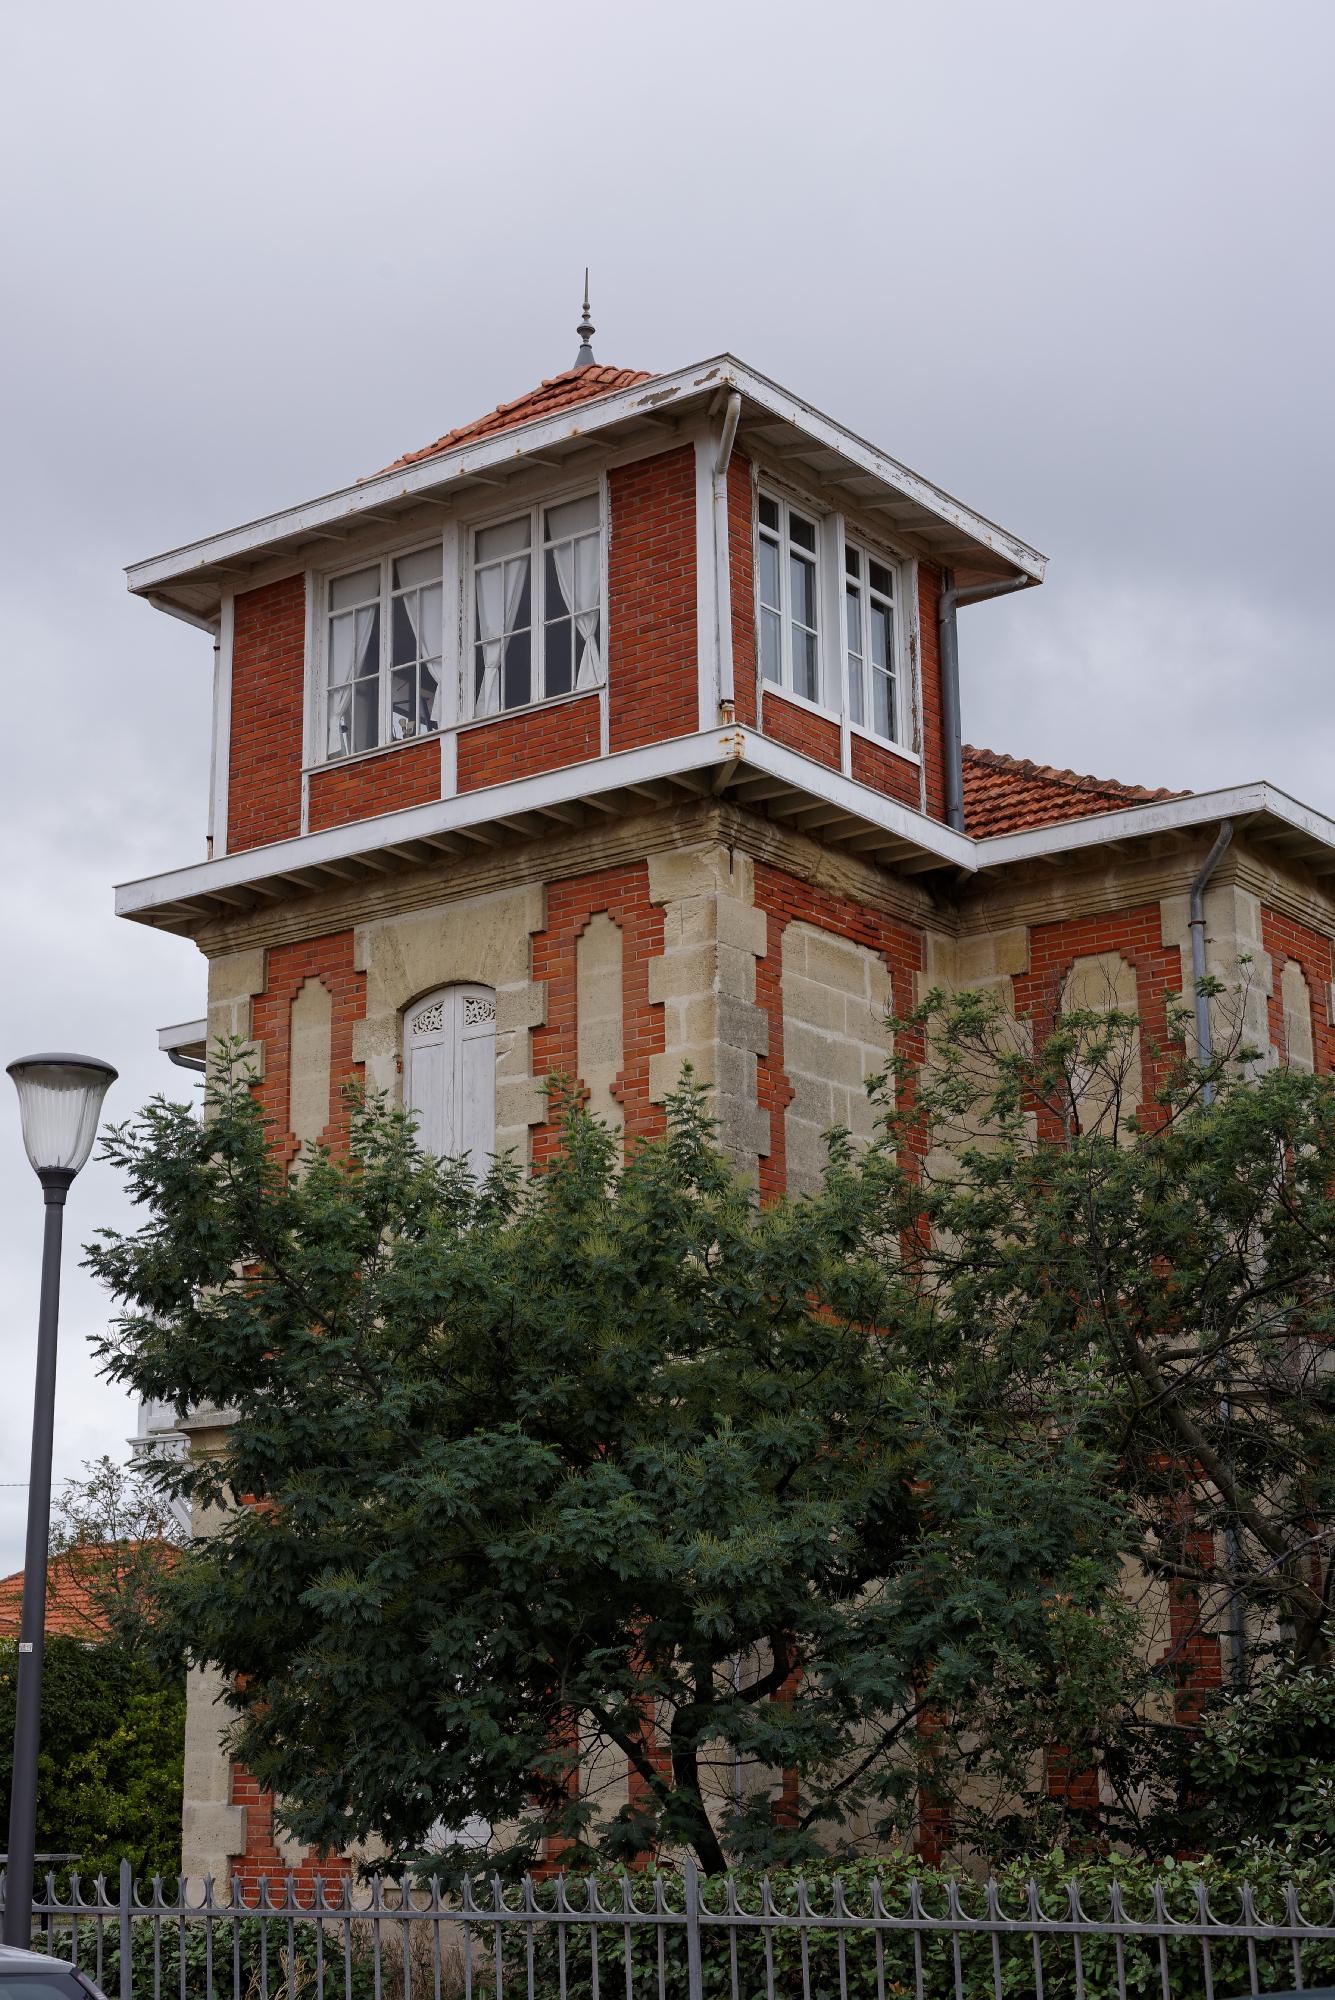 170908-MEDOC Soulac Verdon Hourtin (Gironde) (25)